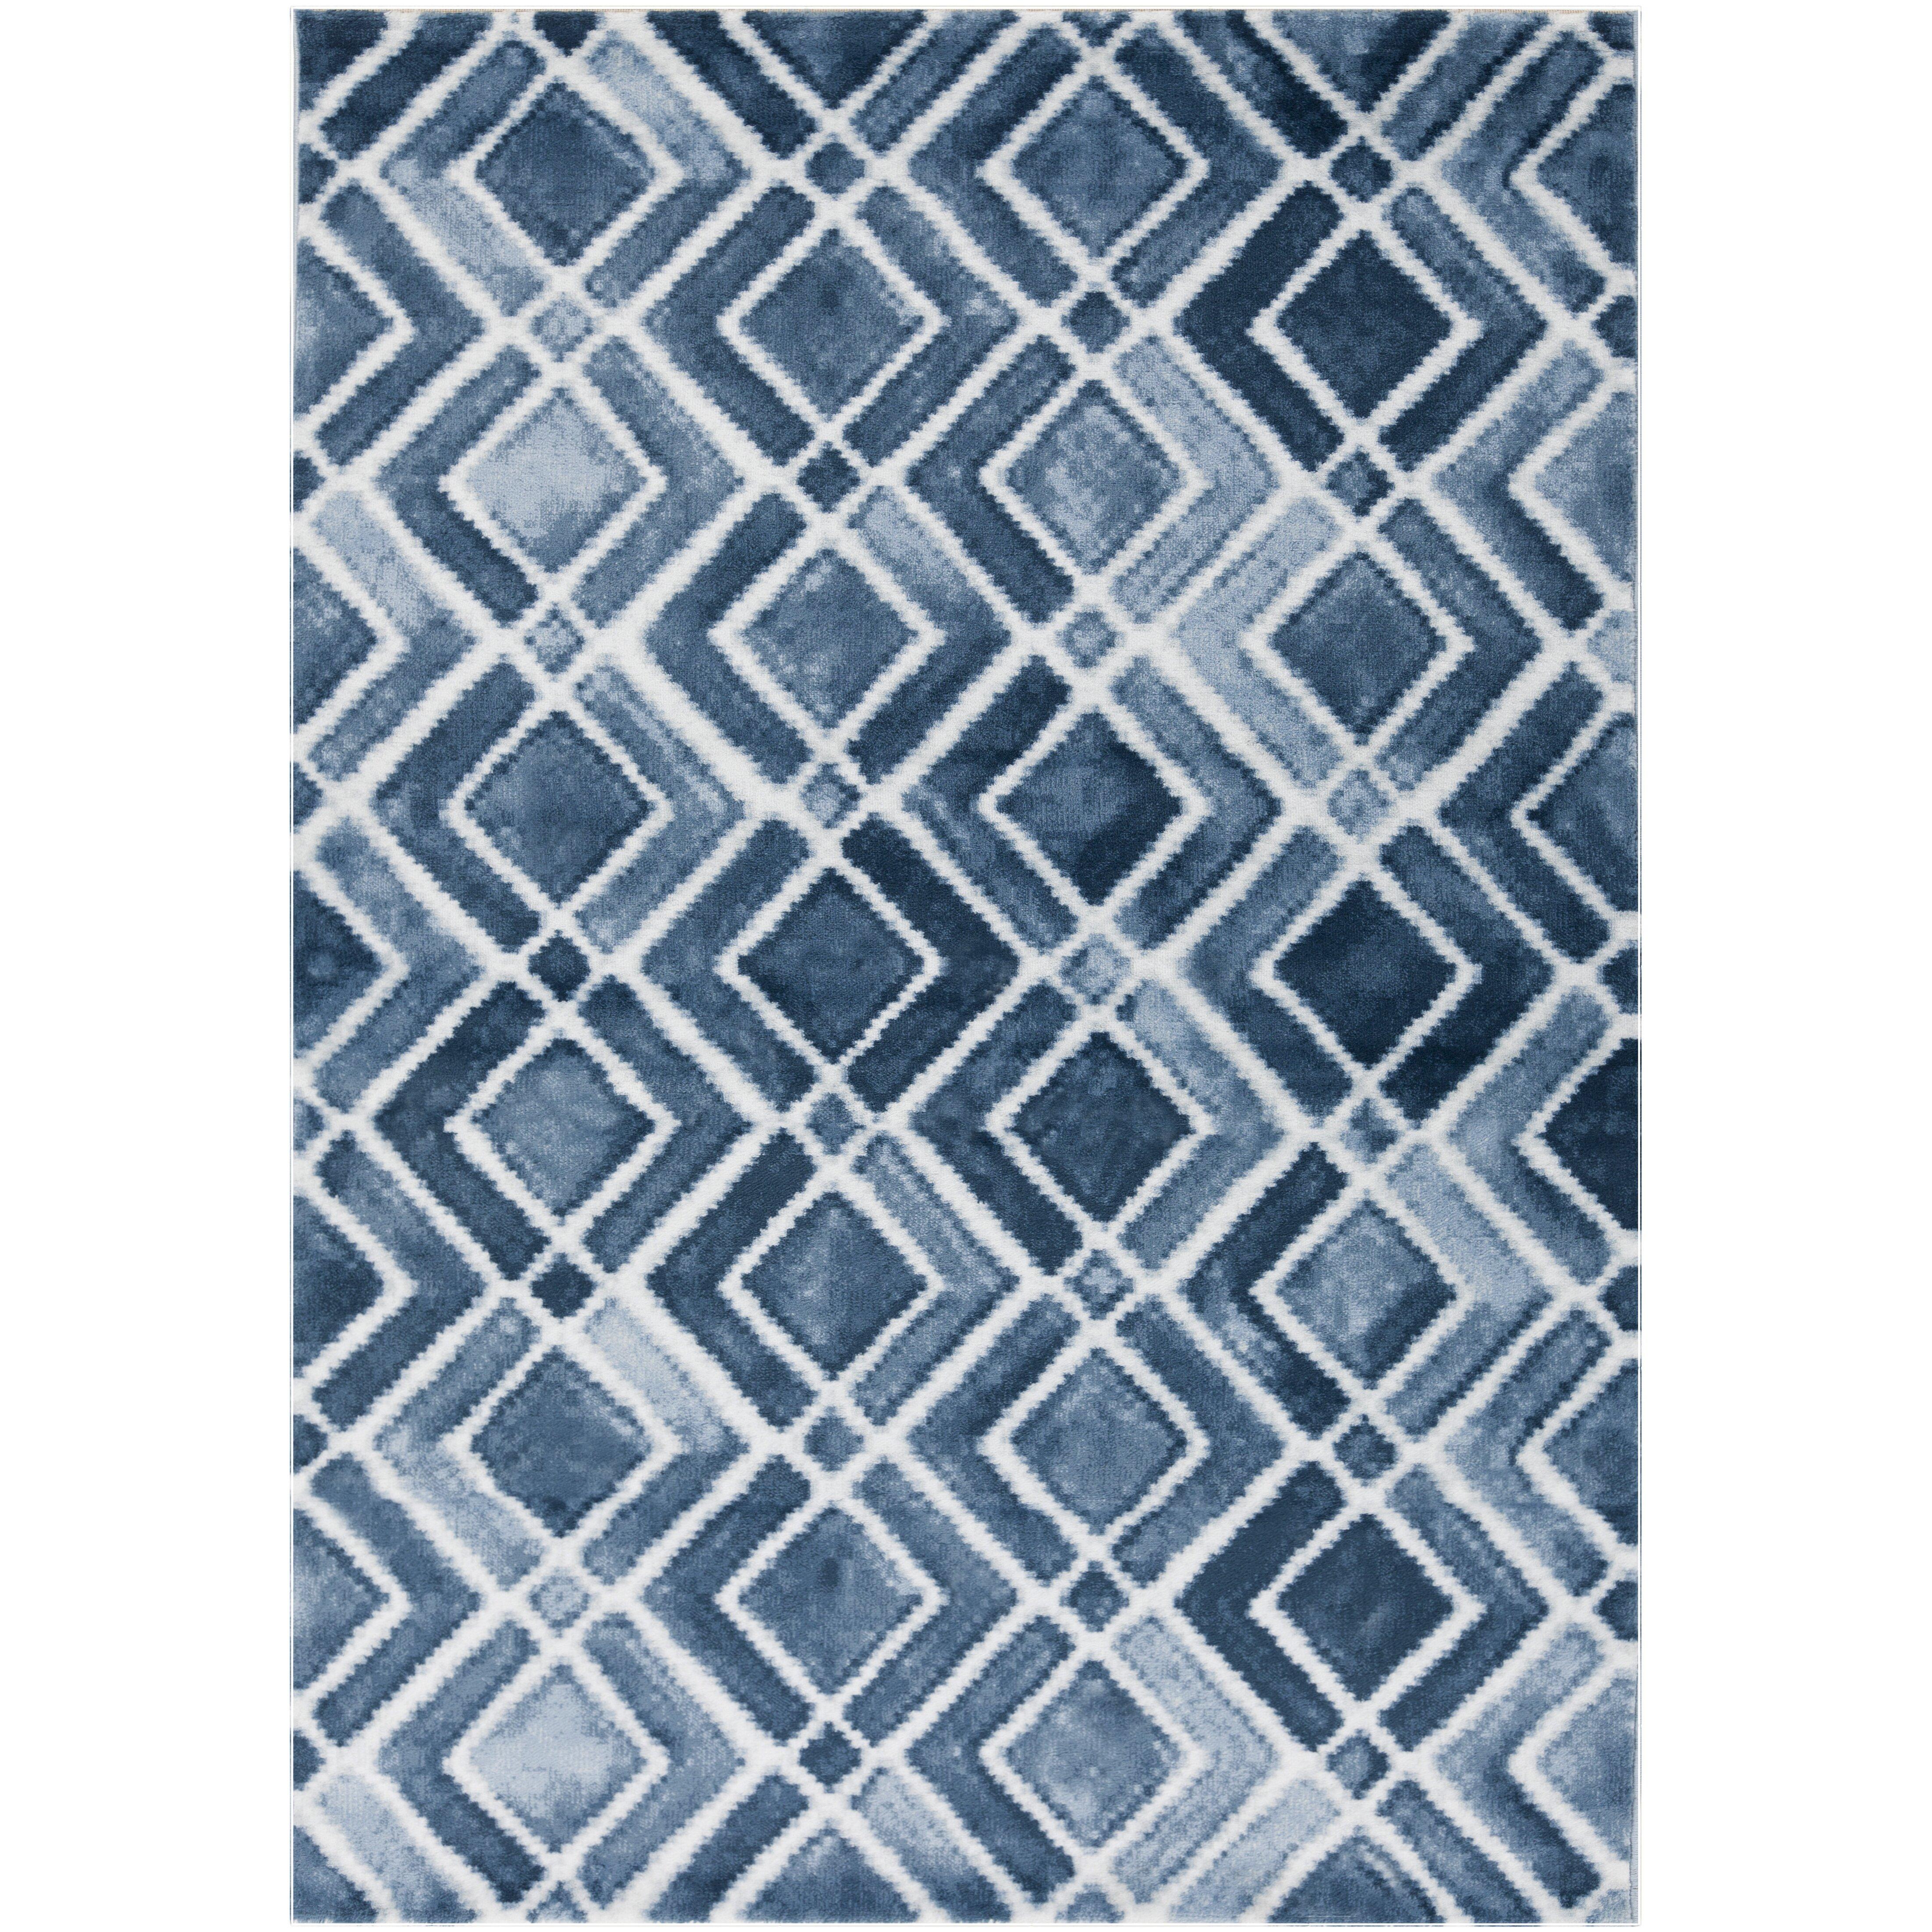 Varick Galleryu0026reg Lamoure Nova Navy Blue White Area Rug